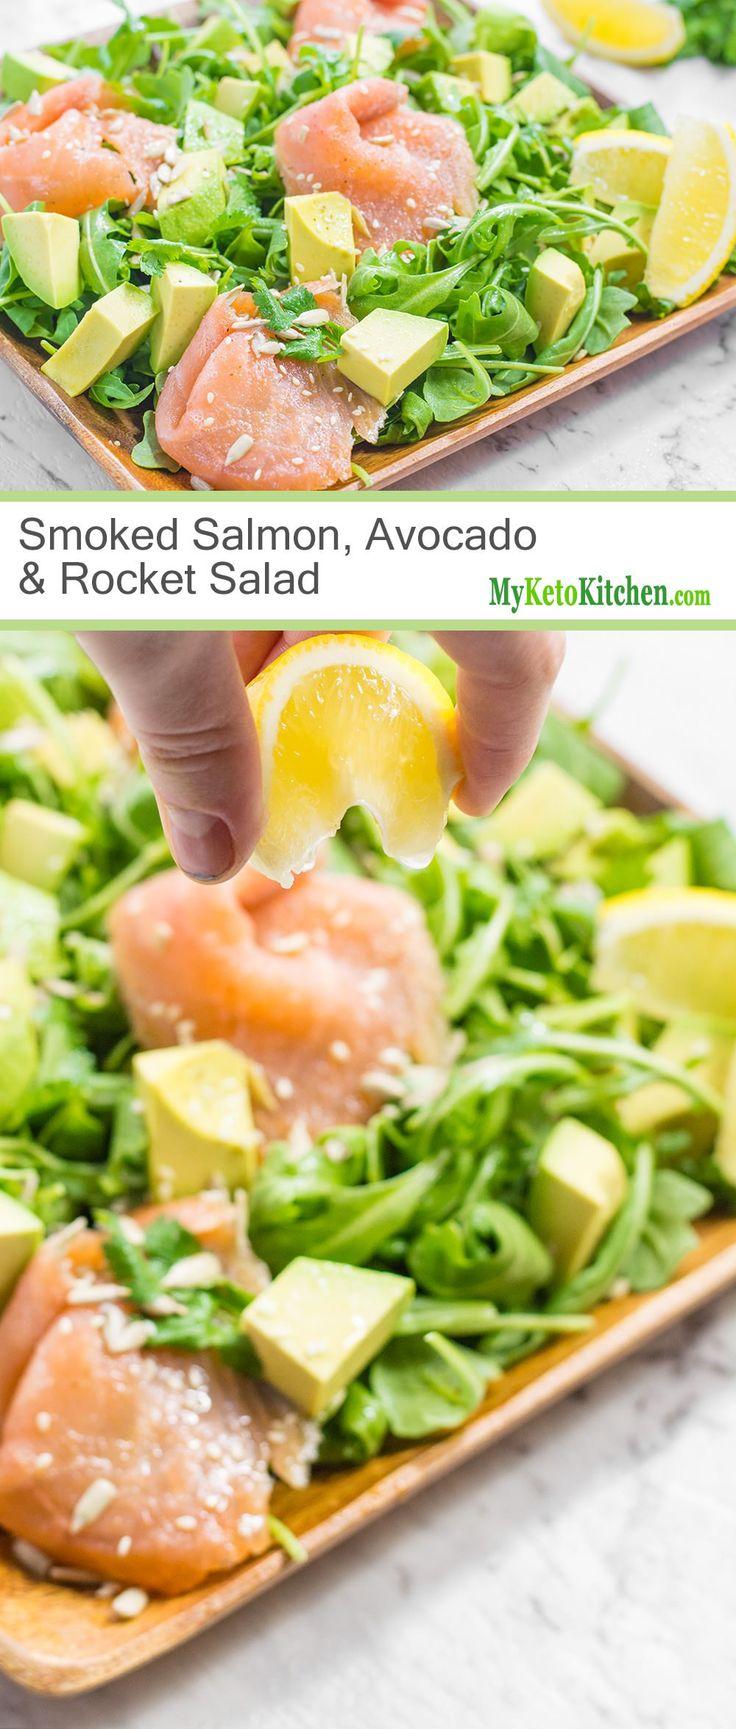 Smoked Salmon, Avocado & Rocket Salad (Low Carb, Keto, Paleo, Gluten Free)